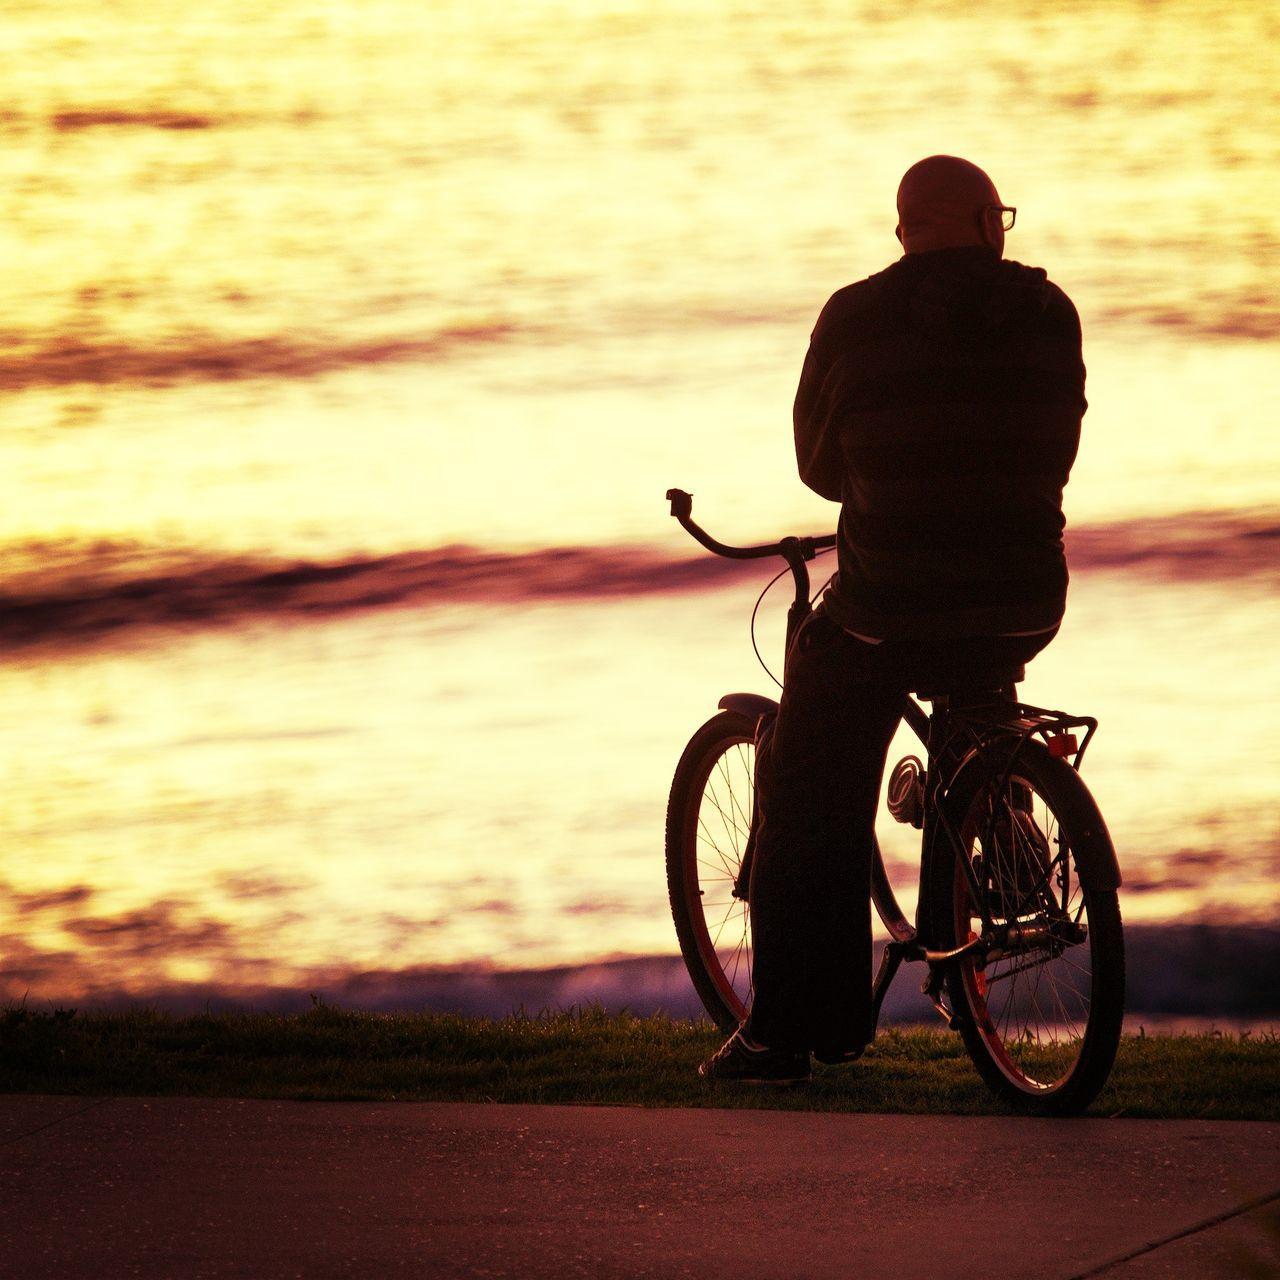 Bike - Cronulla - 21/07/13 Sunrise Sydney Morning